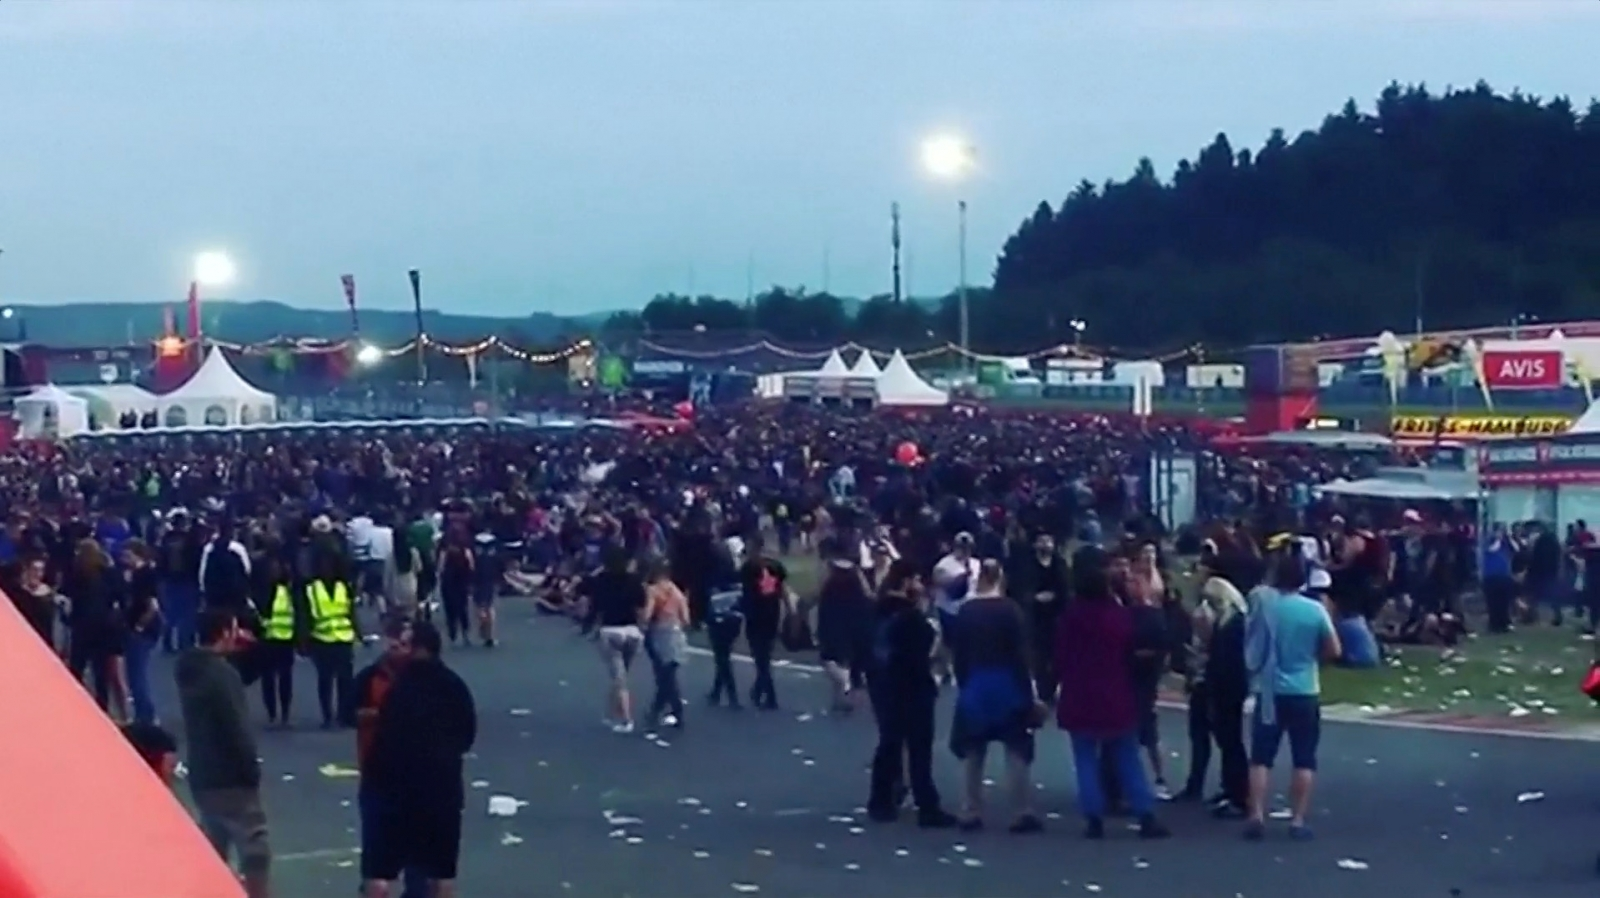 Germany rock festival threat